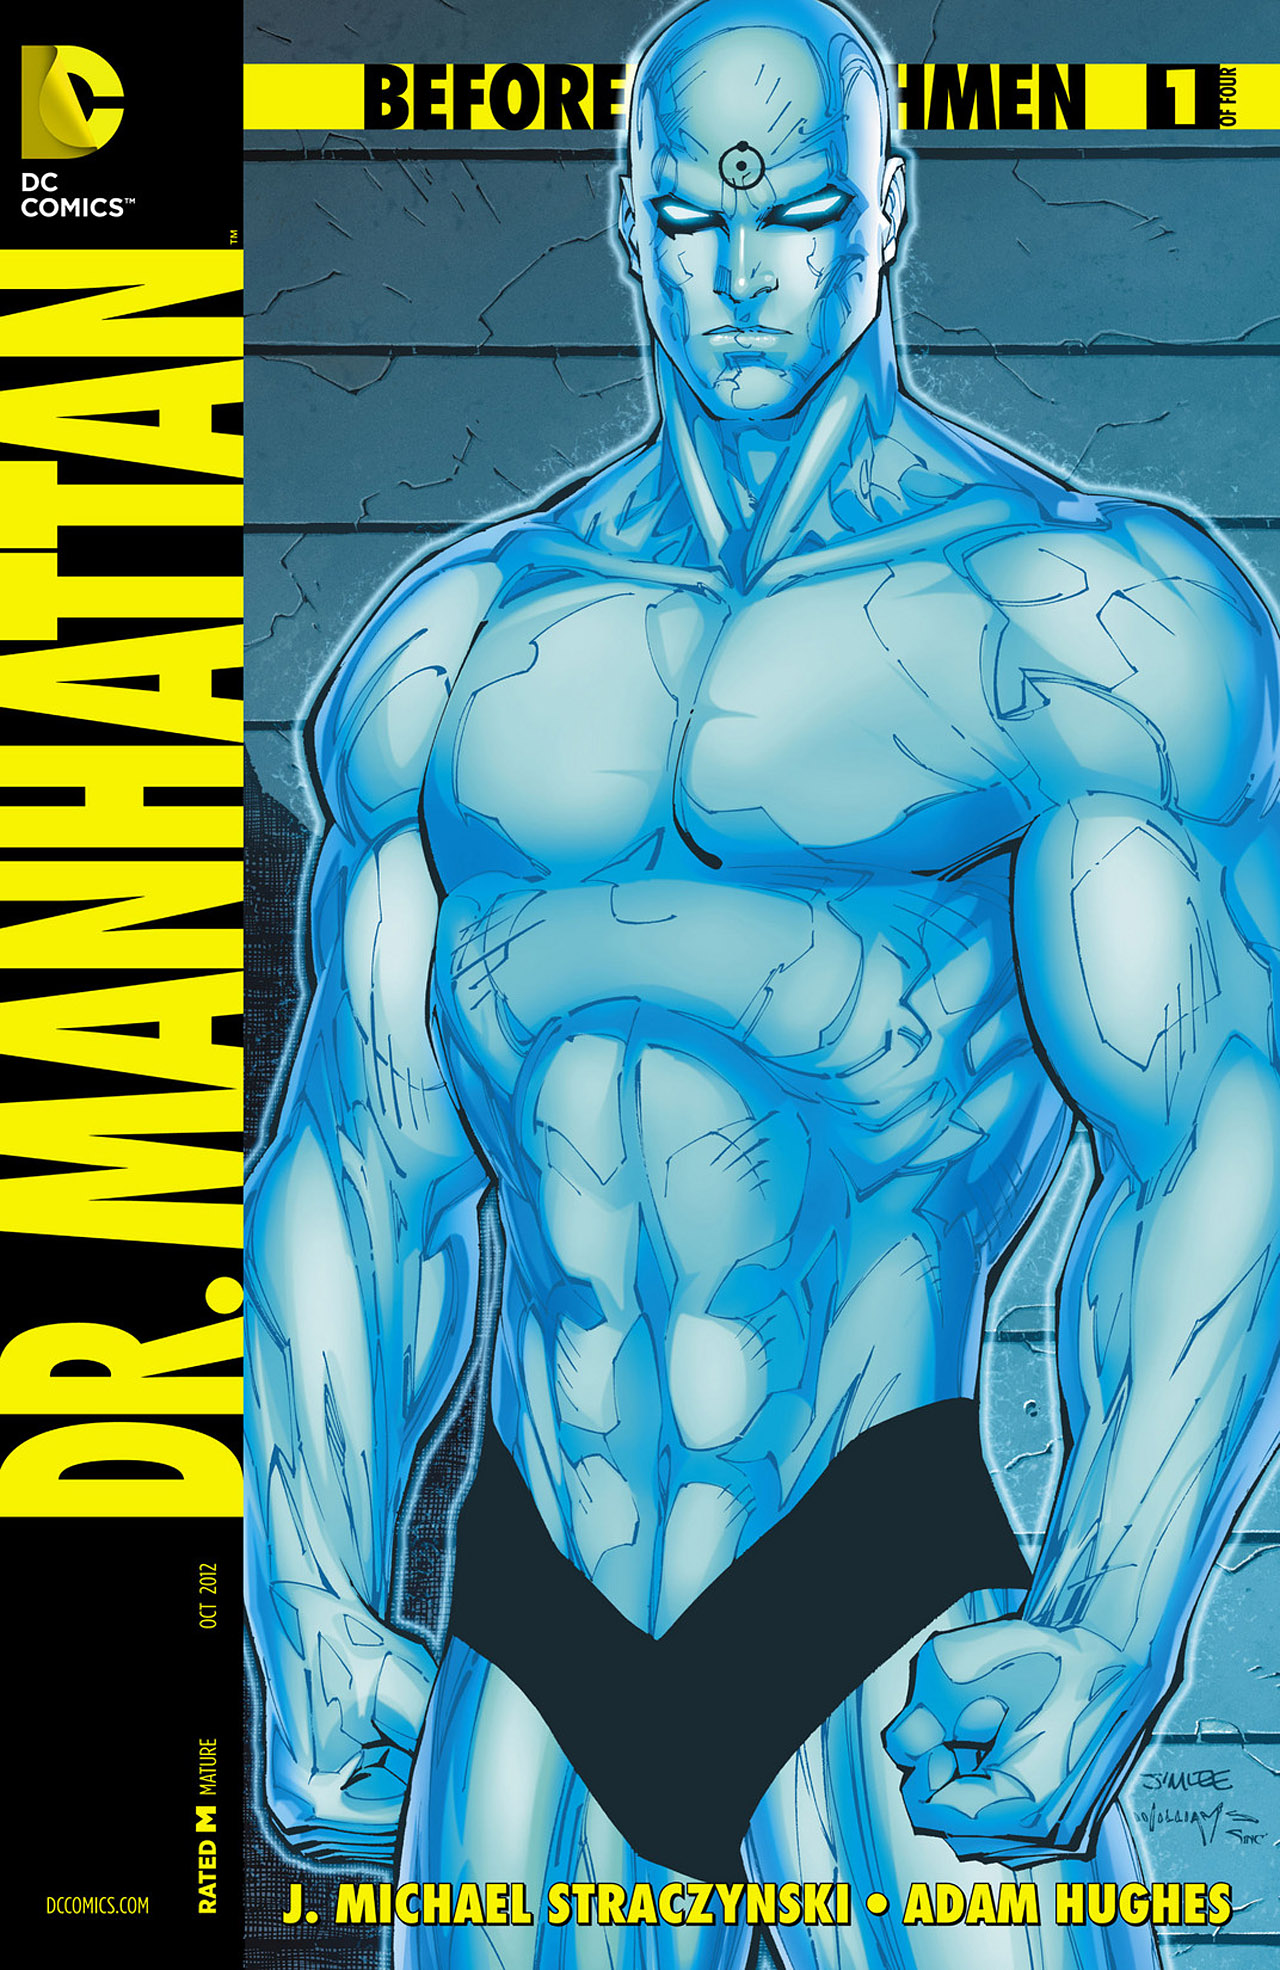 Before_Watchmen_Doctor_Manhattan_Vol_1_1_Variant_B.jpg